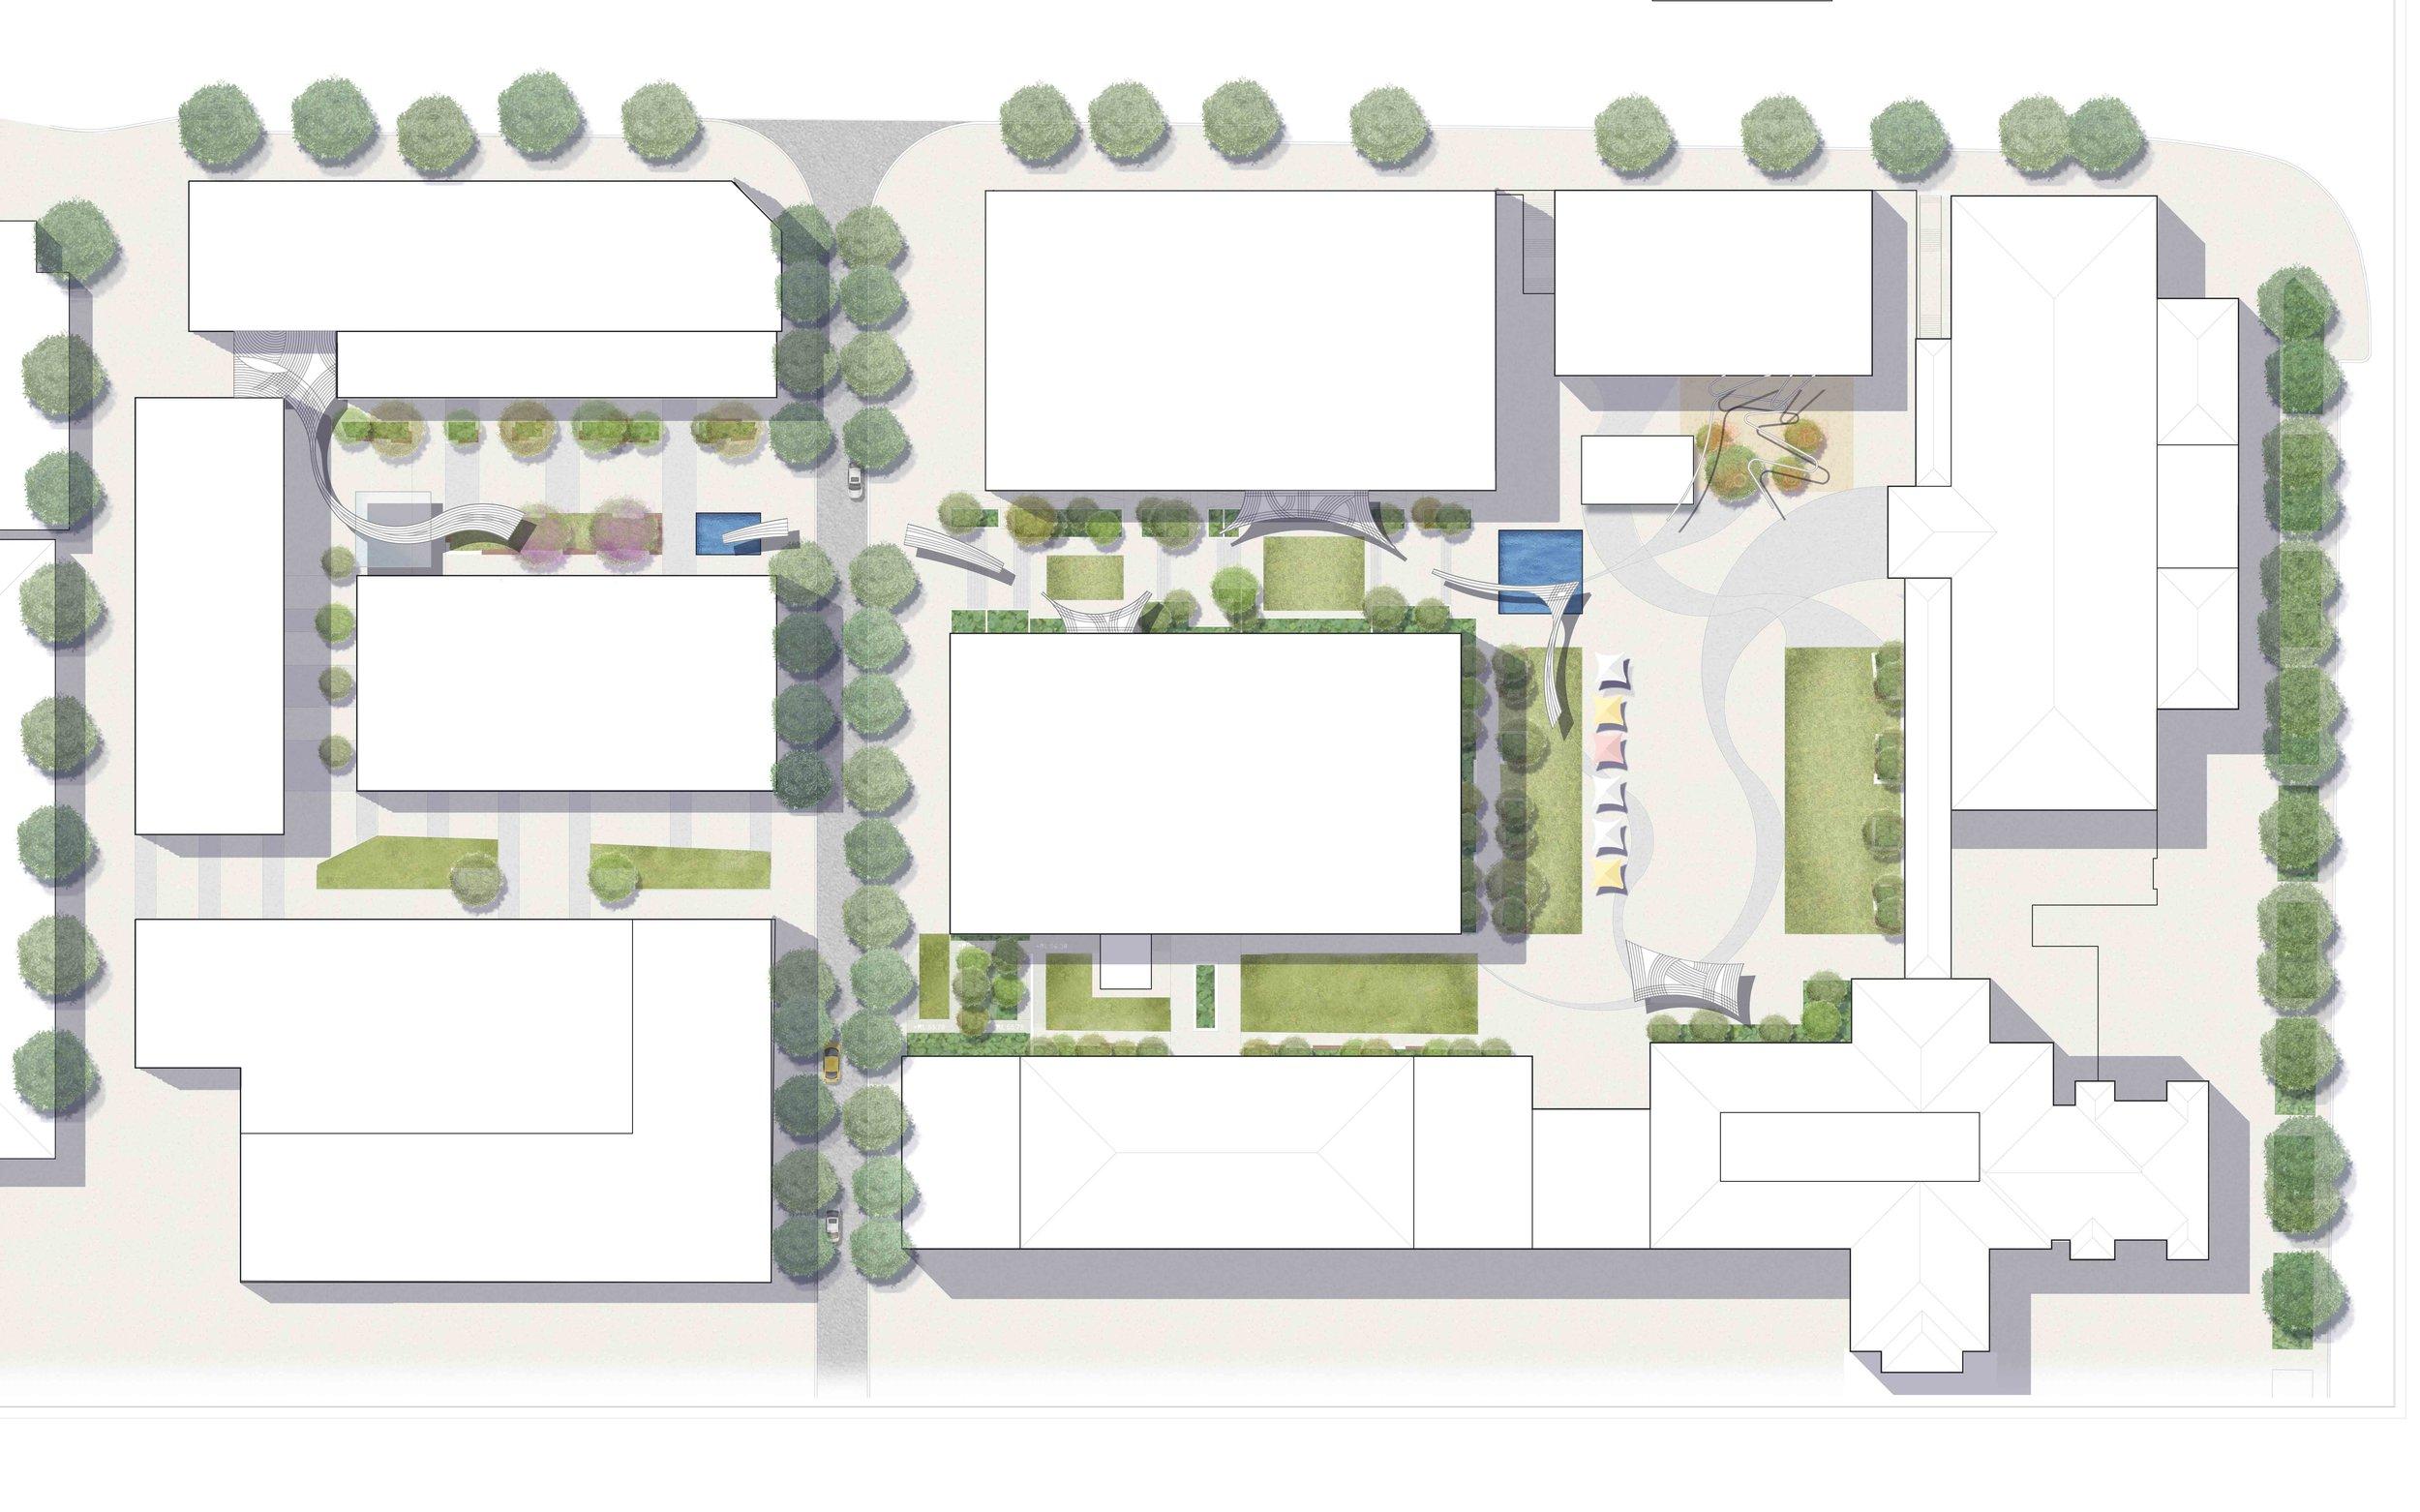 Joondalup City Centre Public Realm Masterplan